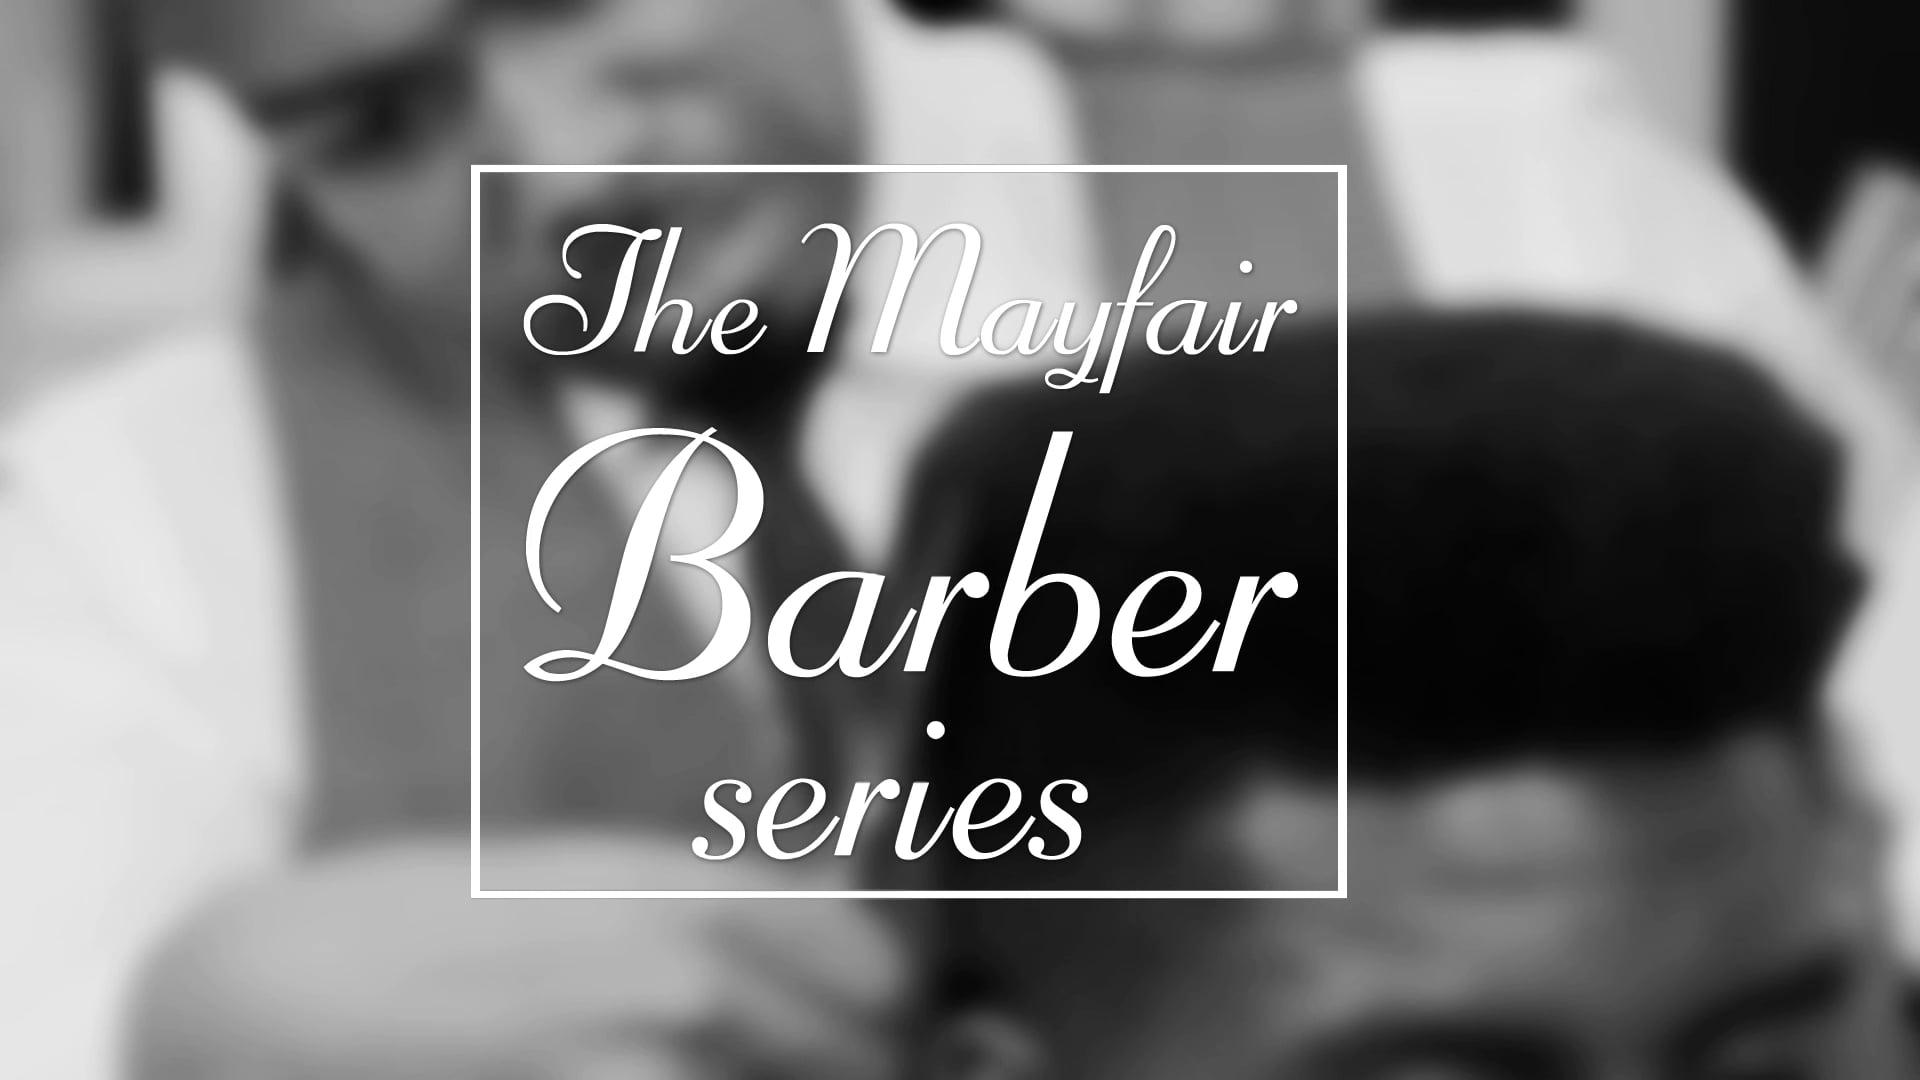 Chris Foster - The Mayfair Barber